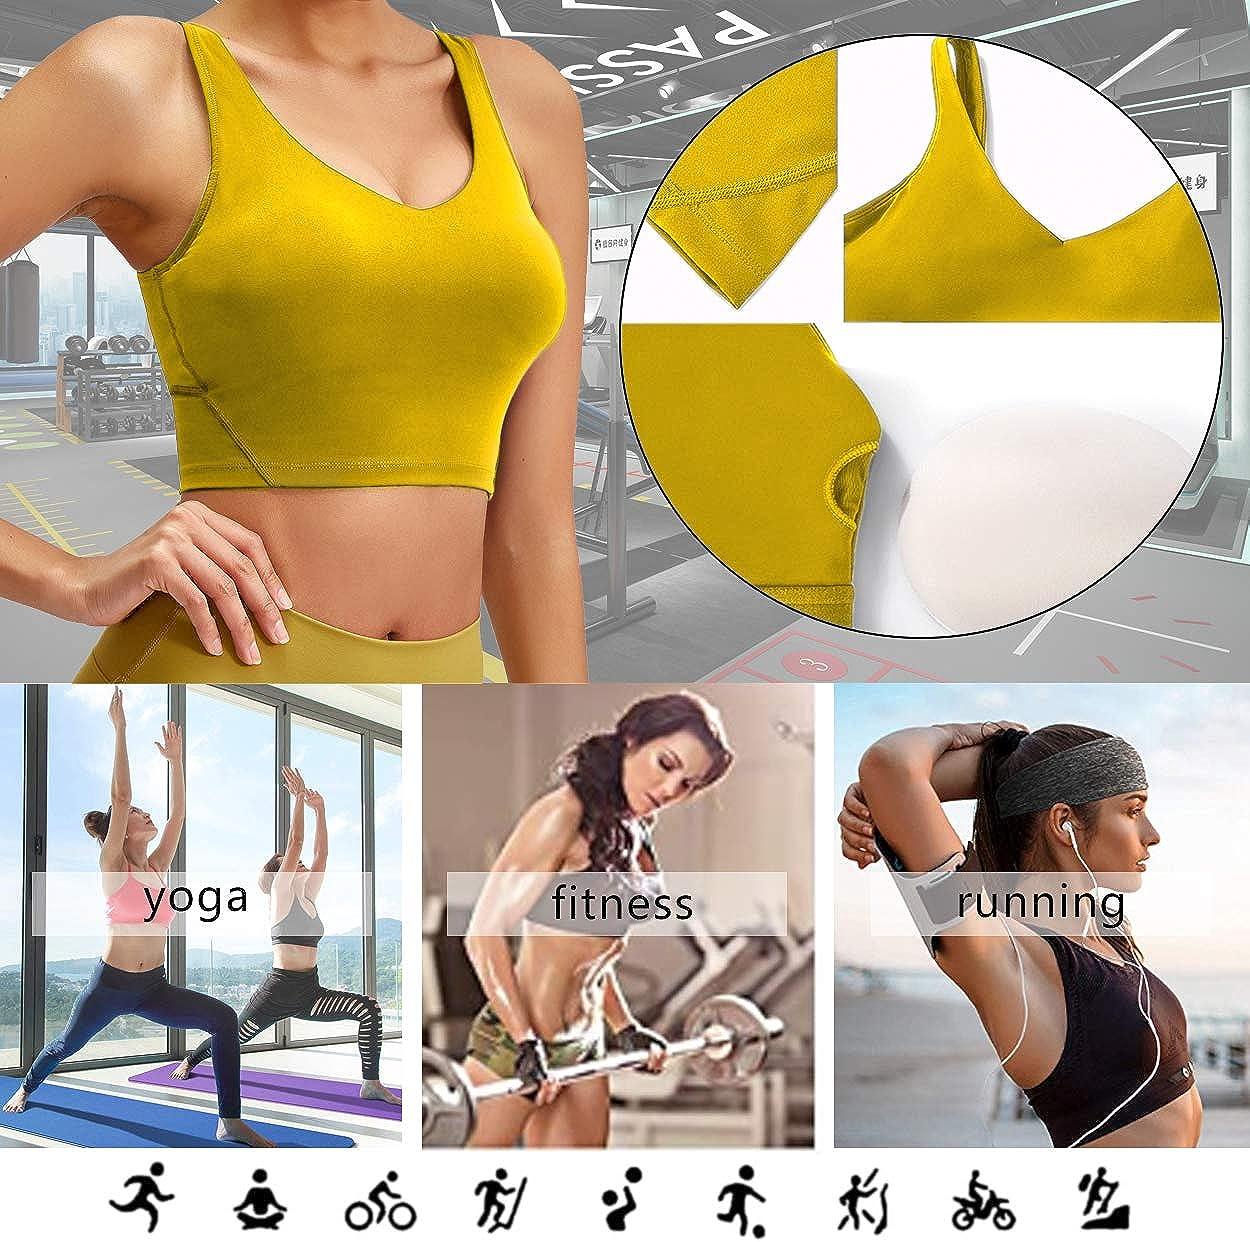 Becfort Womens Sports Underwear Bra Yoga wear Fitness wear Sleeveless Running Vest